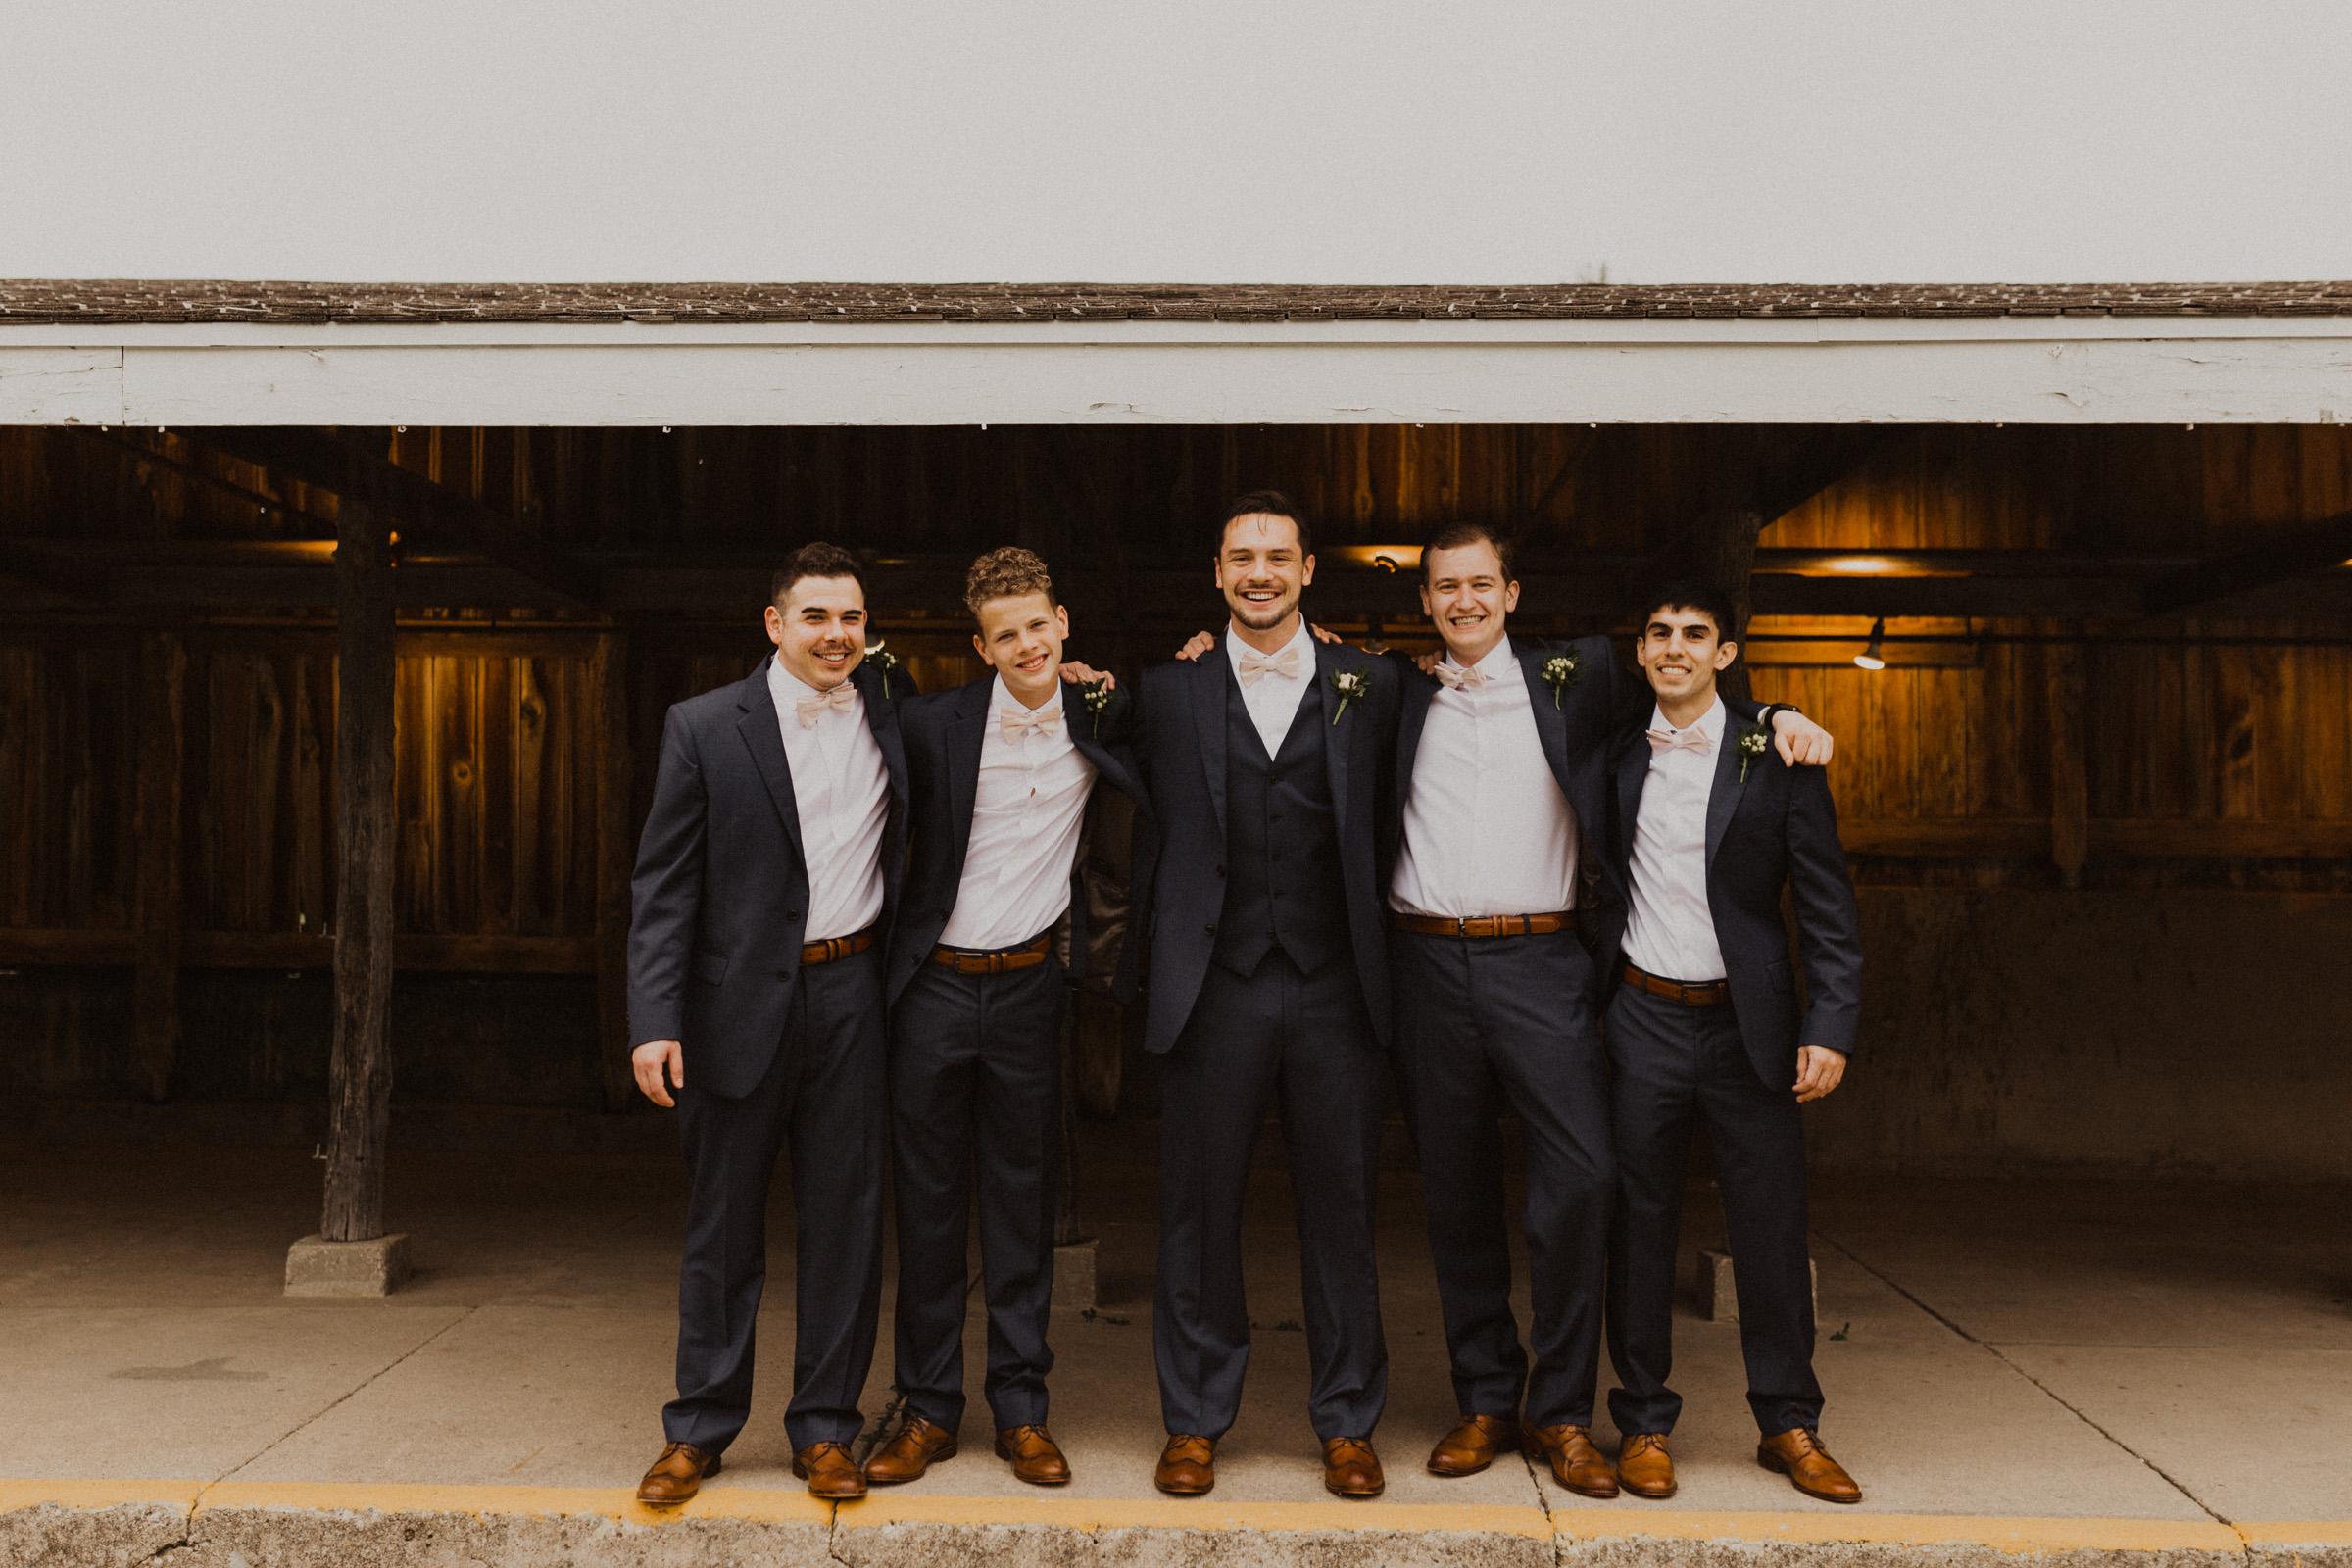 alyssa barletter photography nelson wedding nebraska city lied lodge morton barn spring wedding photographer-19.jpg